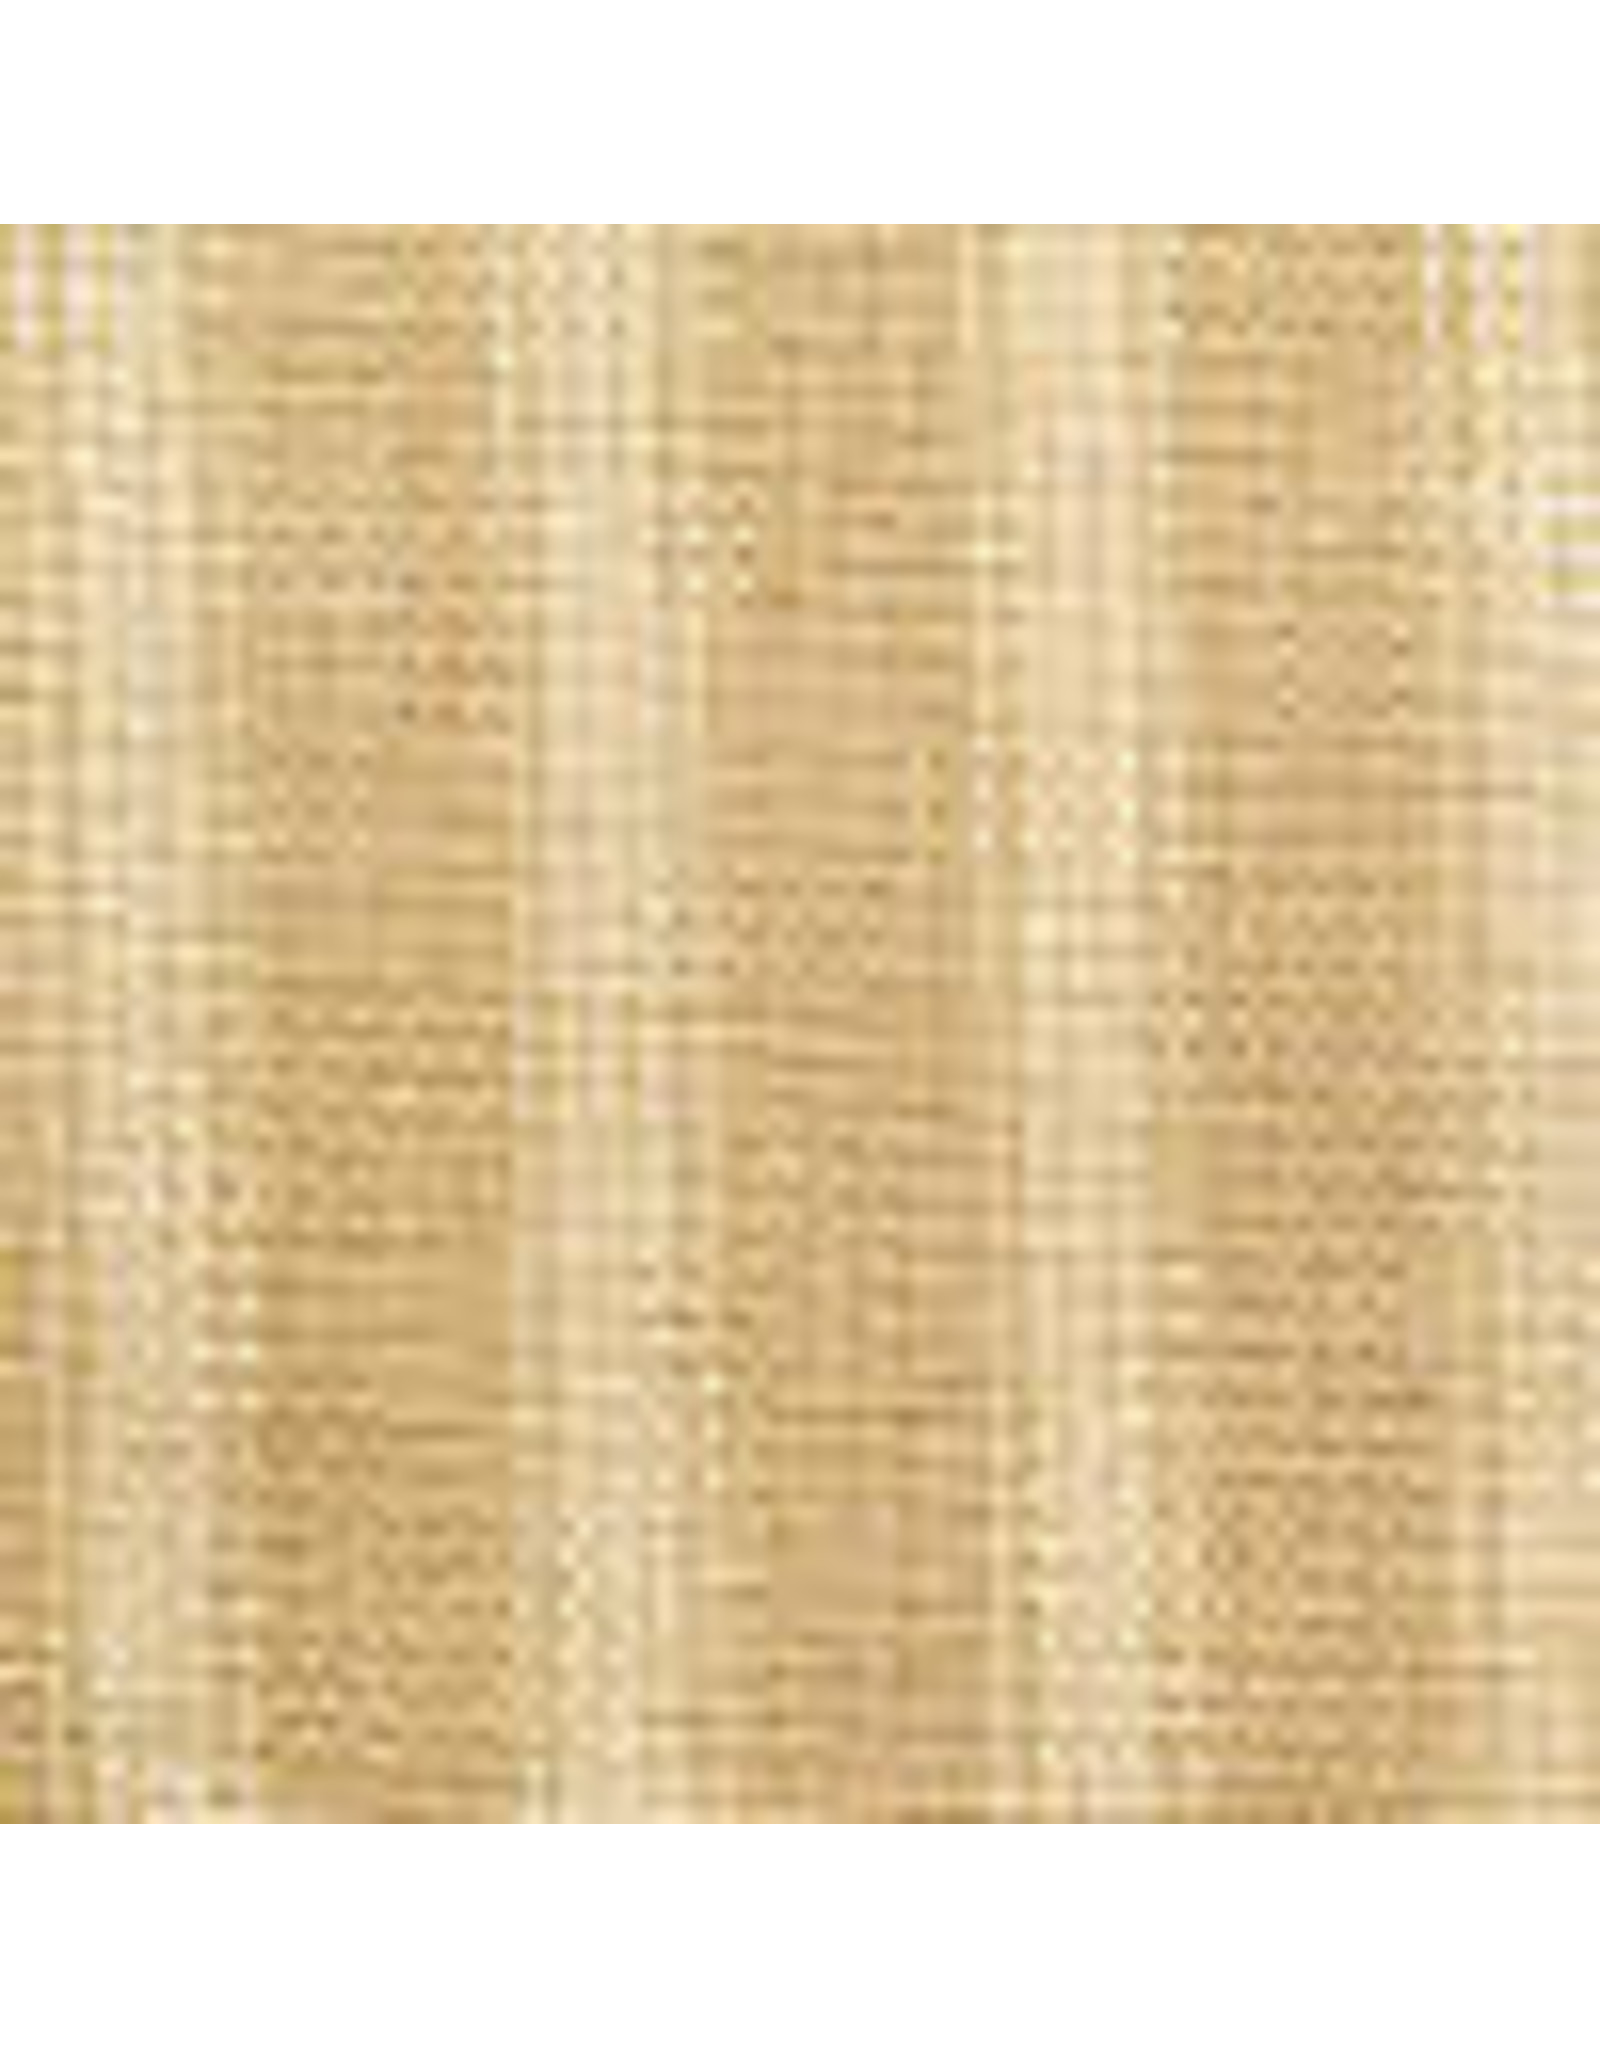 Yd. Wheat and Cream Fabric #86